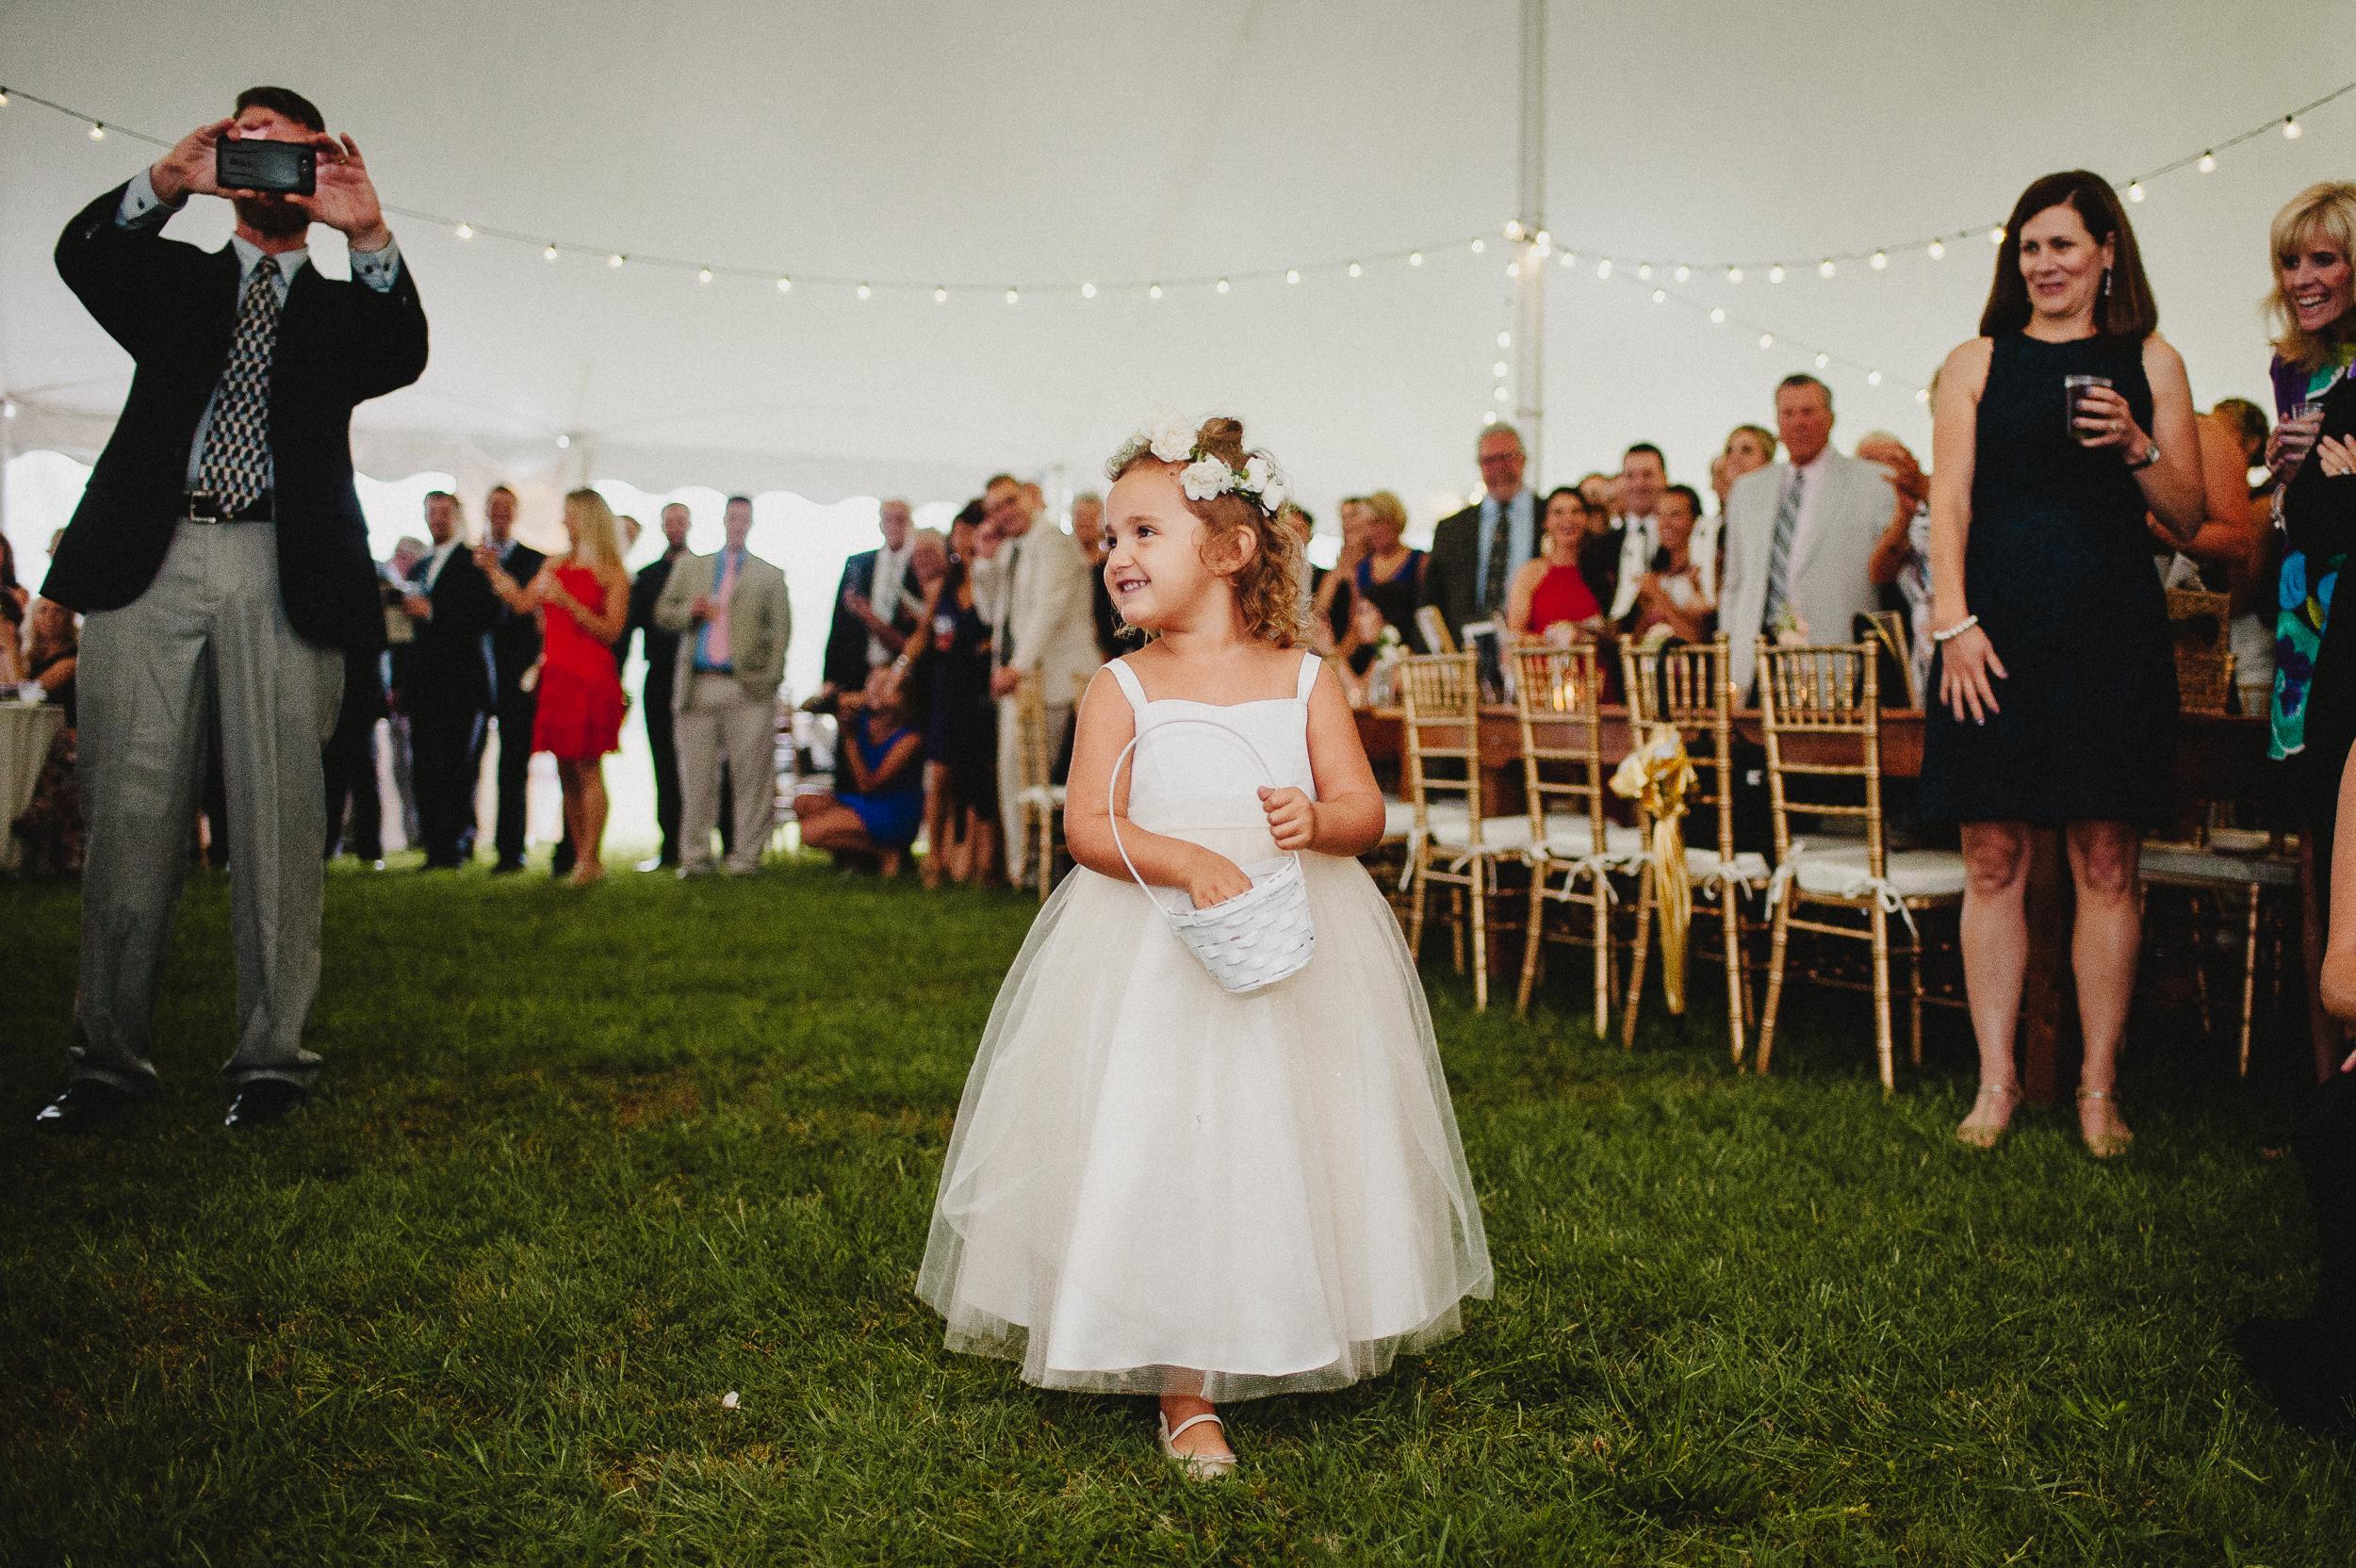 delaware-estate-wedding-photographer-pat-robinson-photography-87.jpg